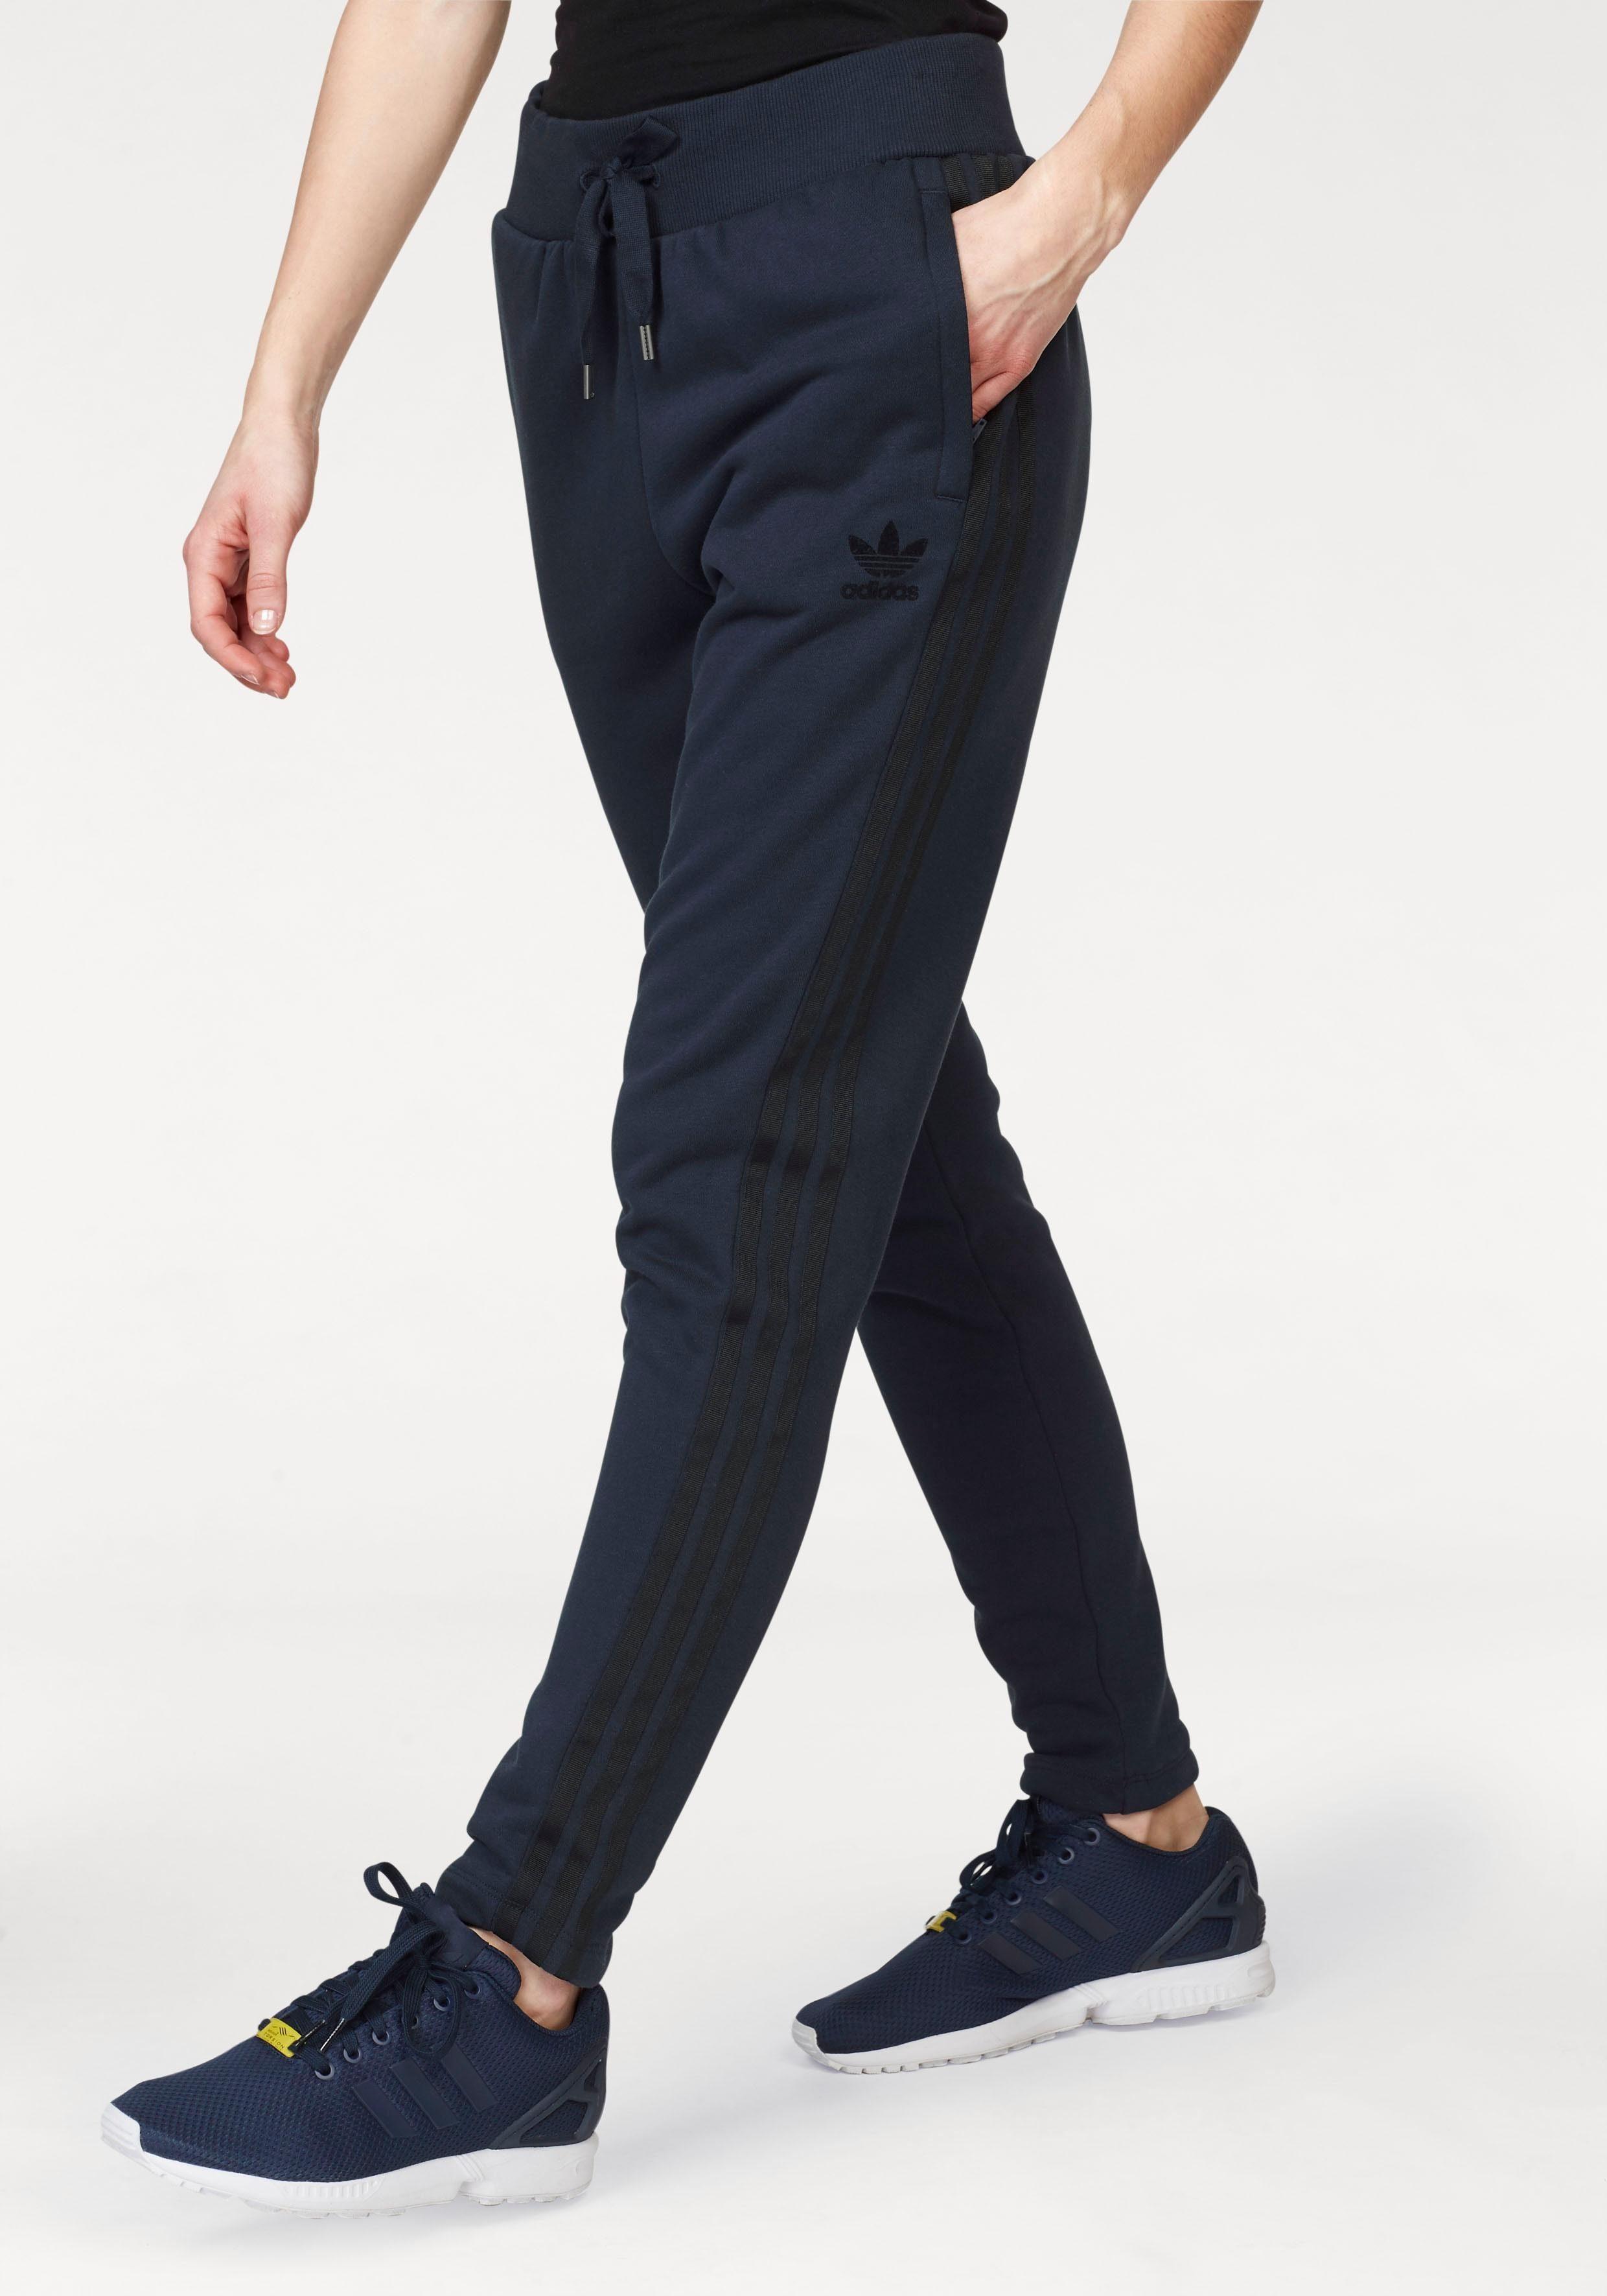 adidas Originals Jogginghose »LOW CROTCH TRACK PANT« online kaufen